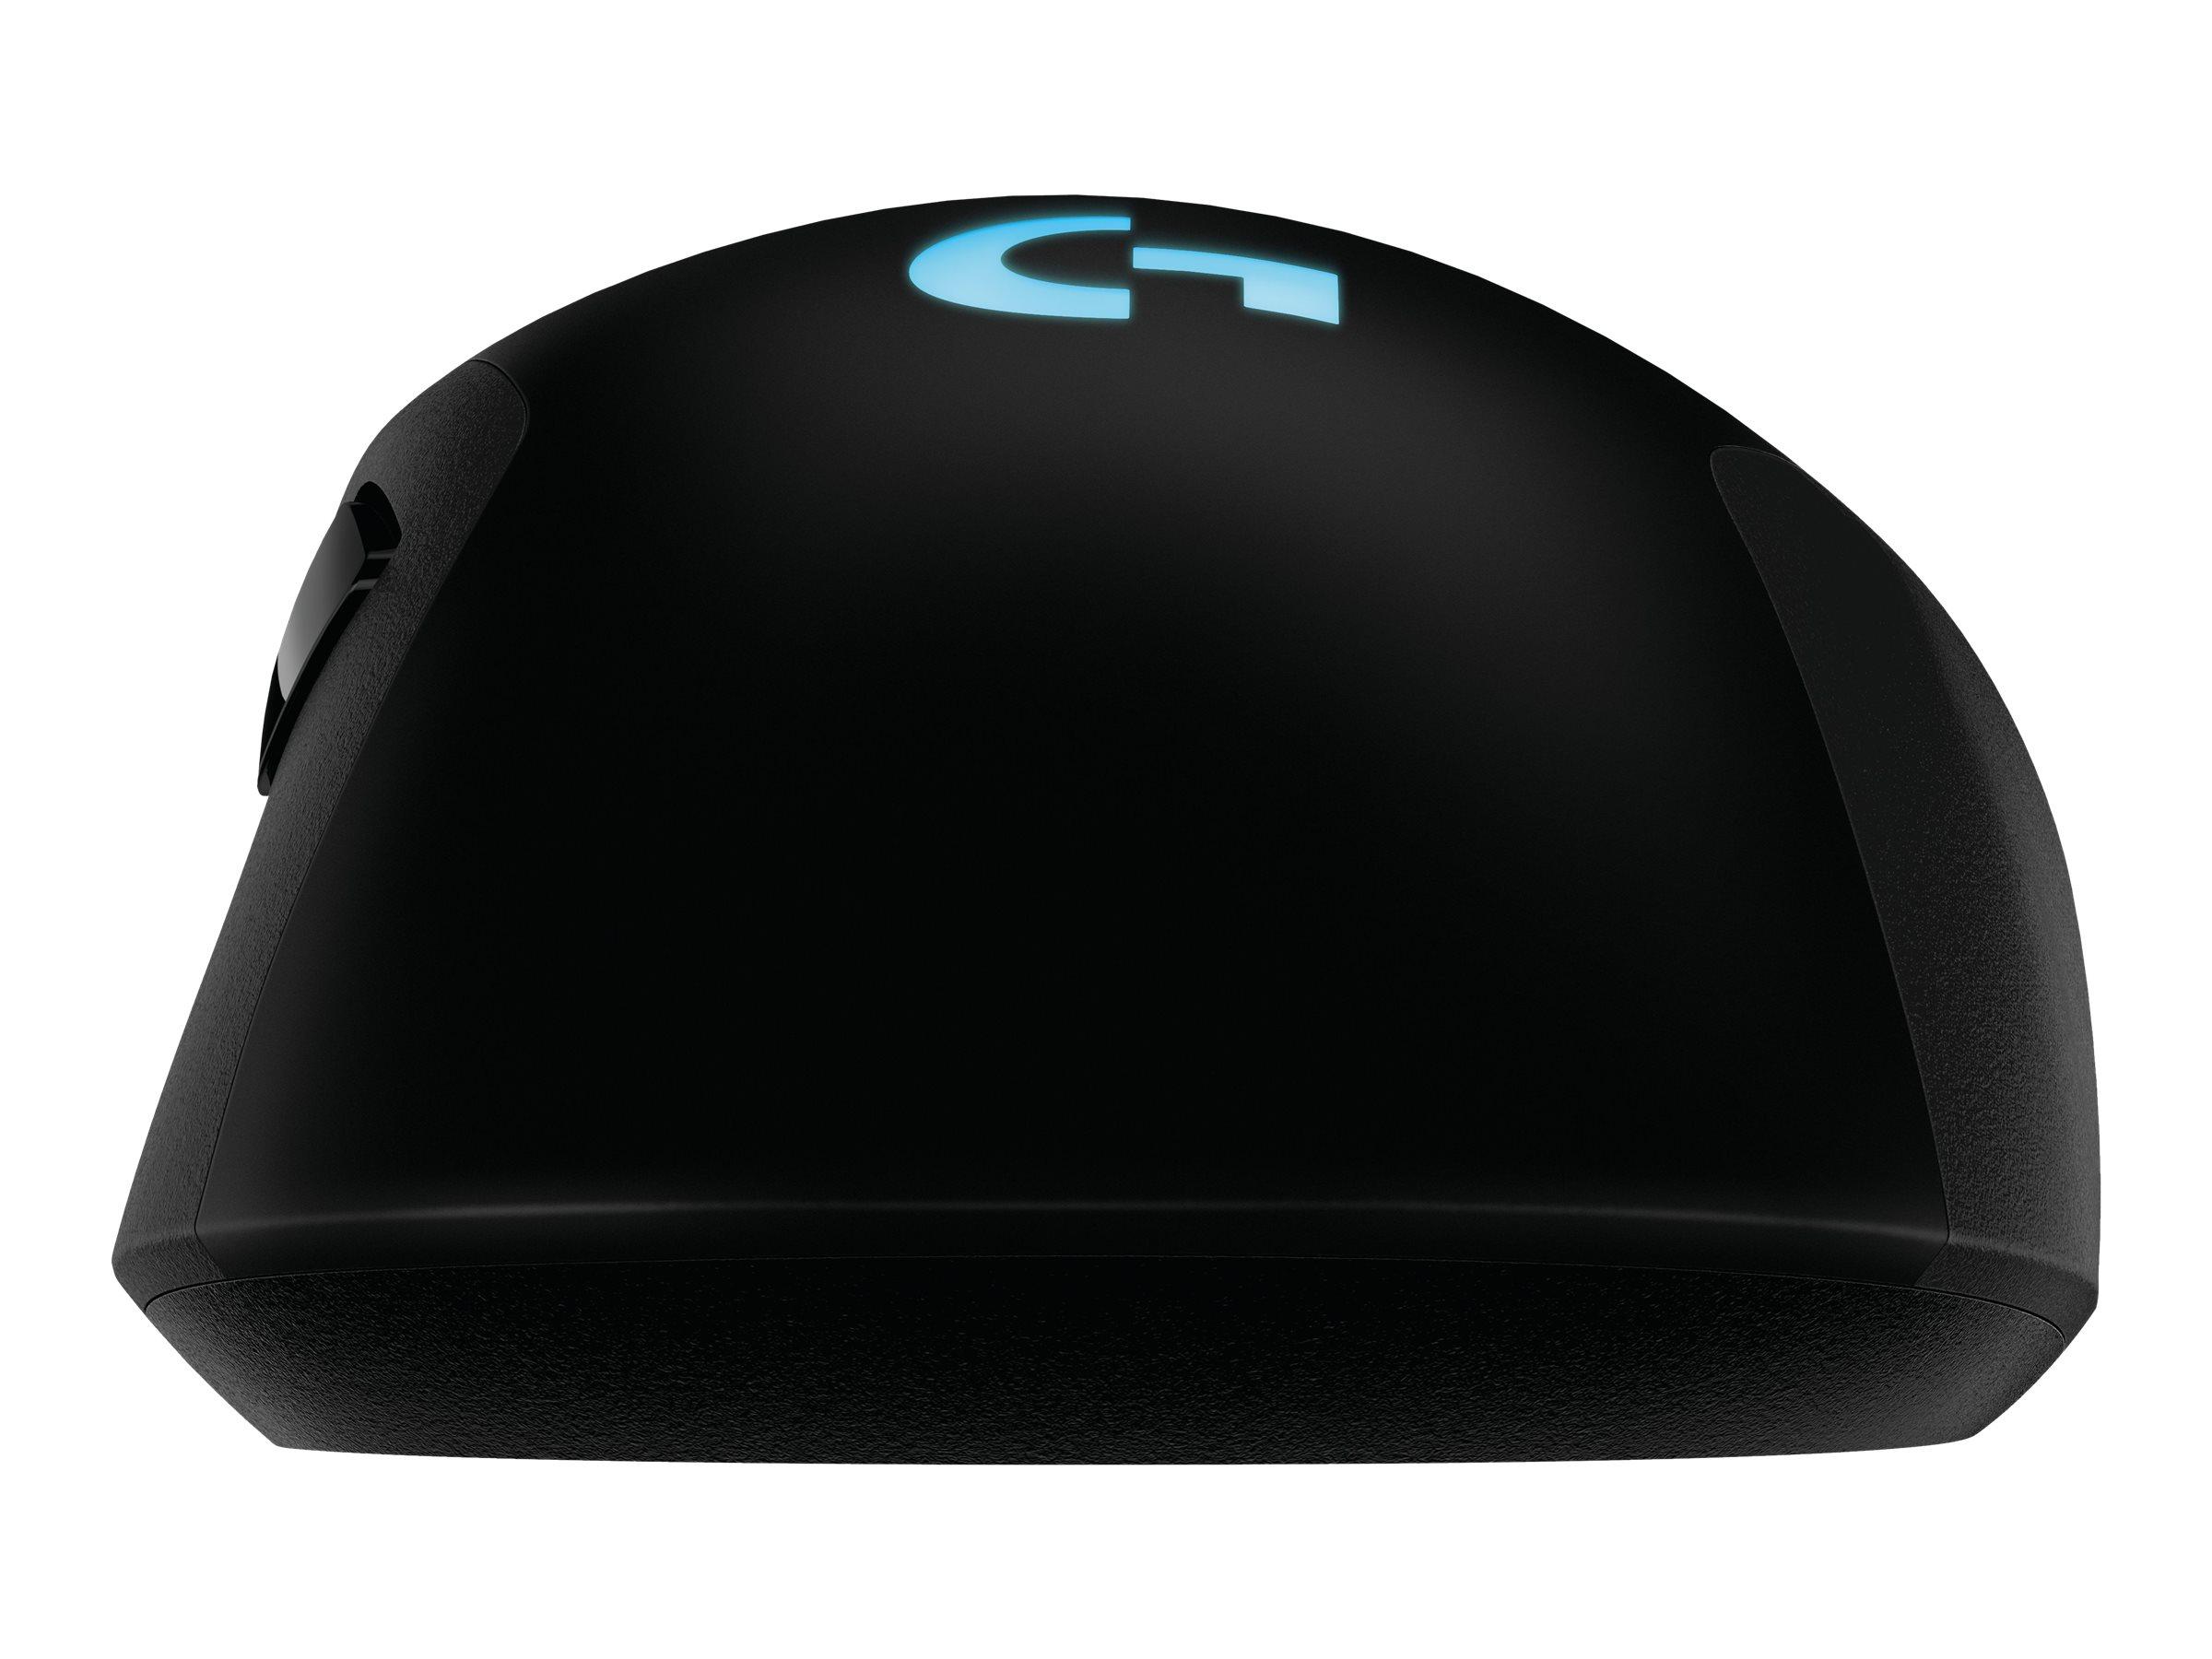 Logitech Gaming Mouse G703 - Maus - optisch - 6 Tasten - kabellos, kabelgebunden - 2.4 GHz